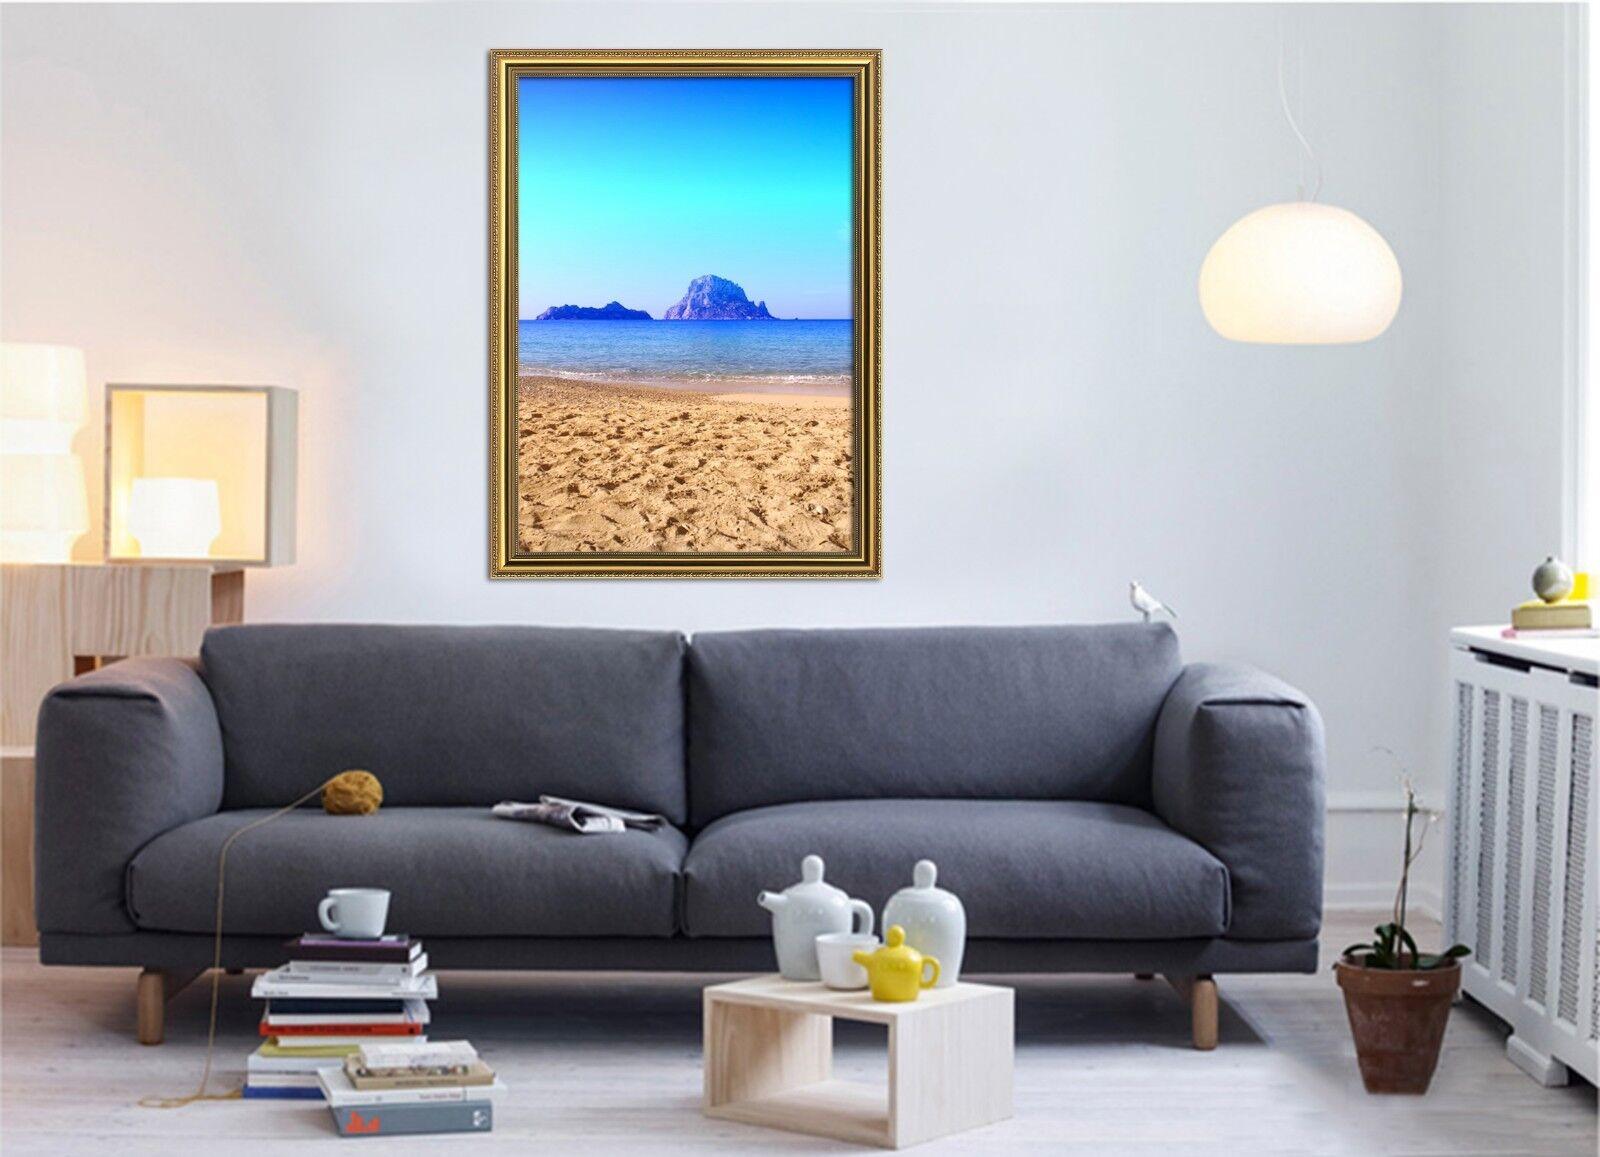 3D plage Footimpressions 57 Framed affiche accueil Decor impression Painting Art AJ AU